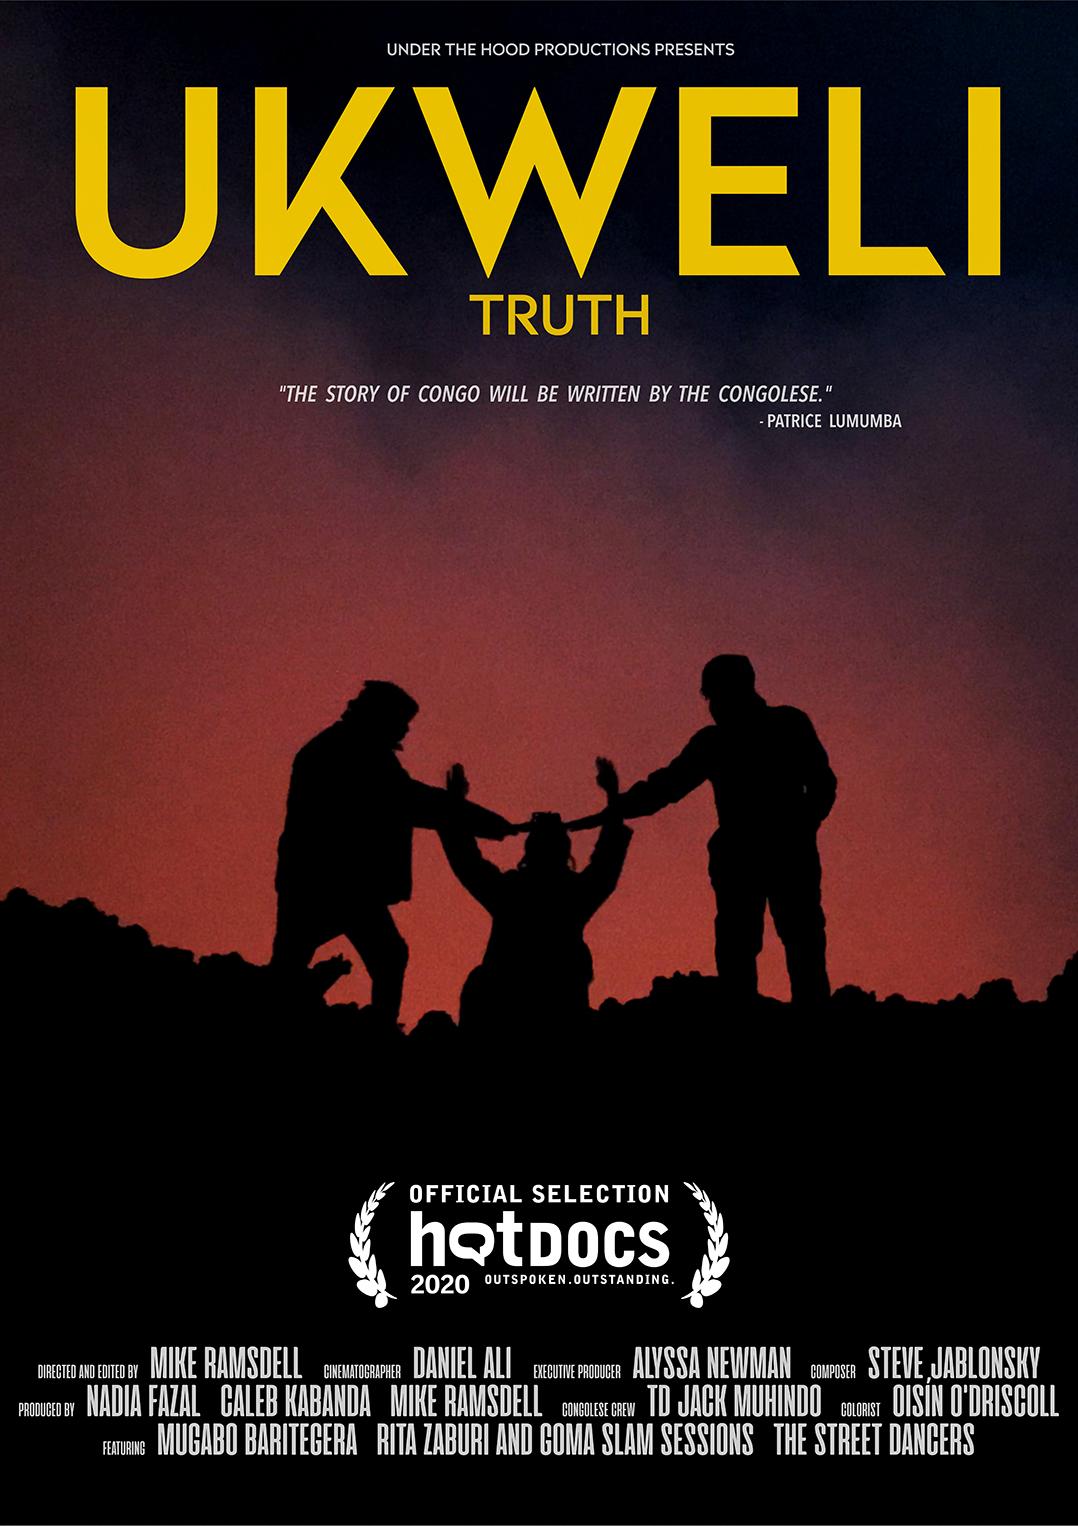 Movie poster for the <i>Ukweli</i> documentary